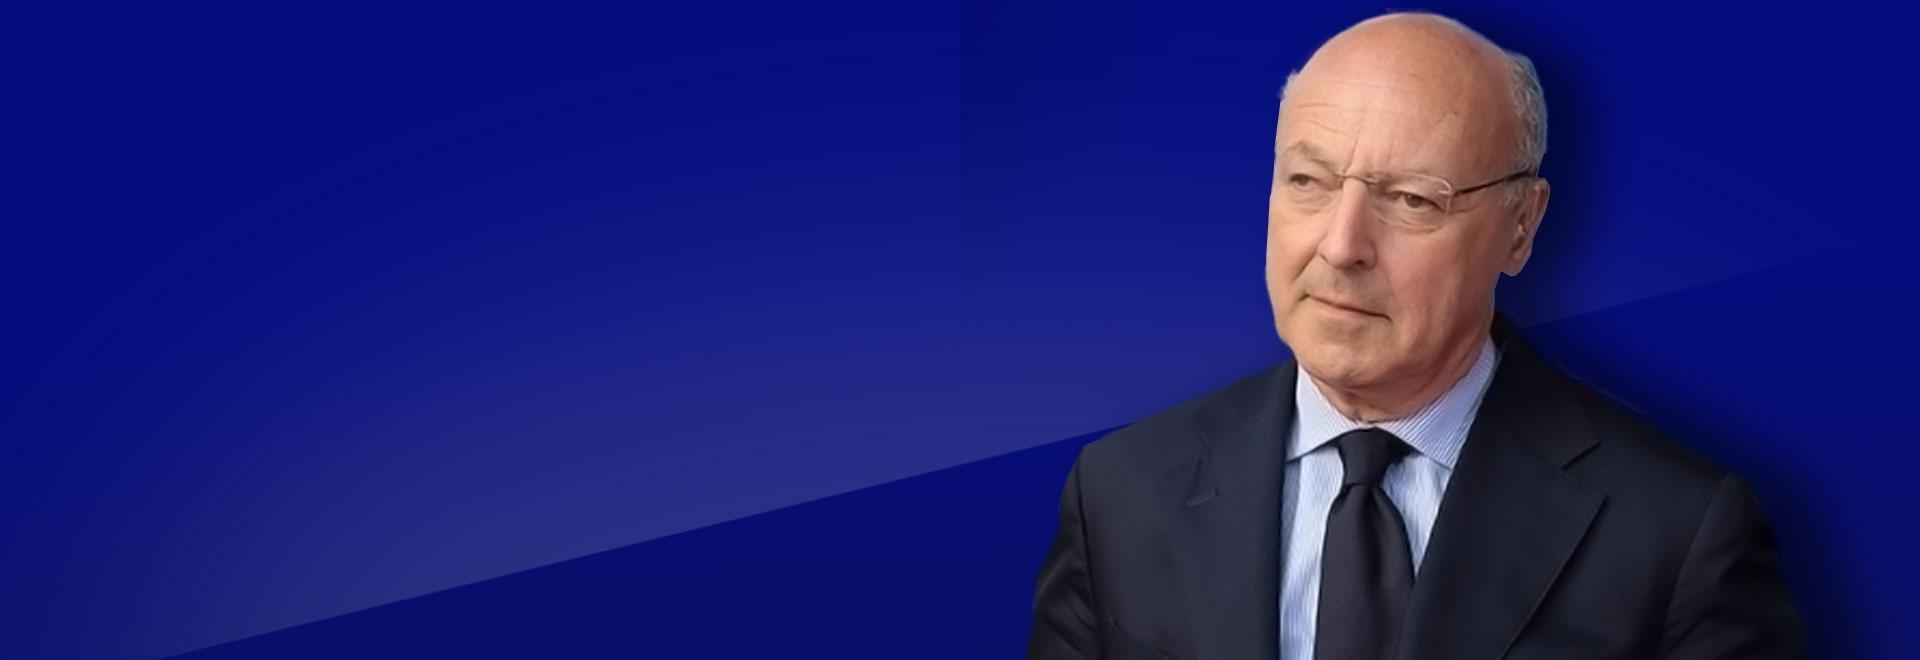 Intervista esclusiva a Giuseppe Marotta